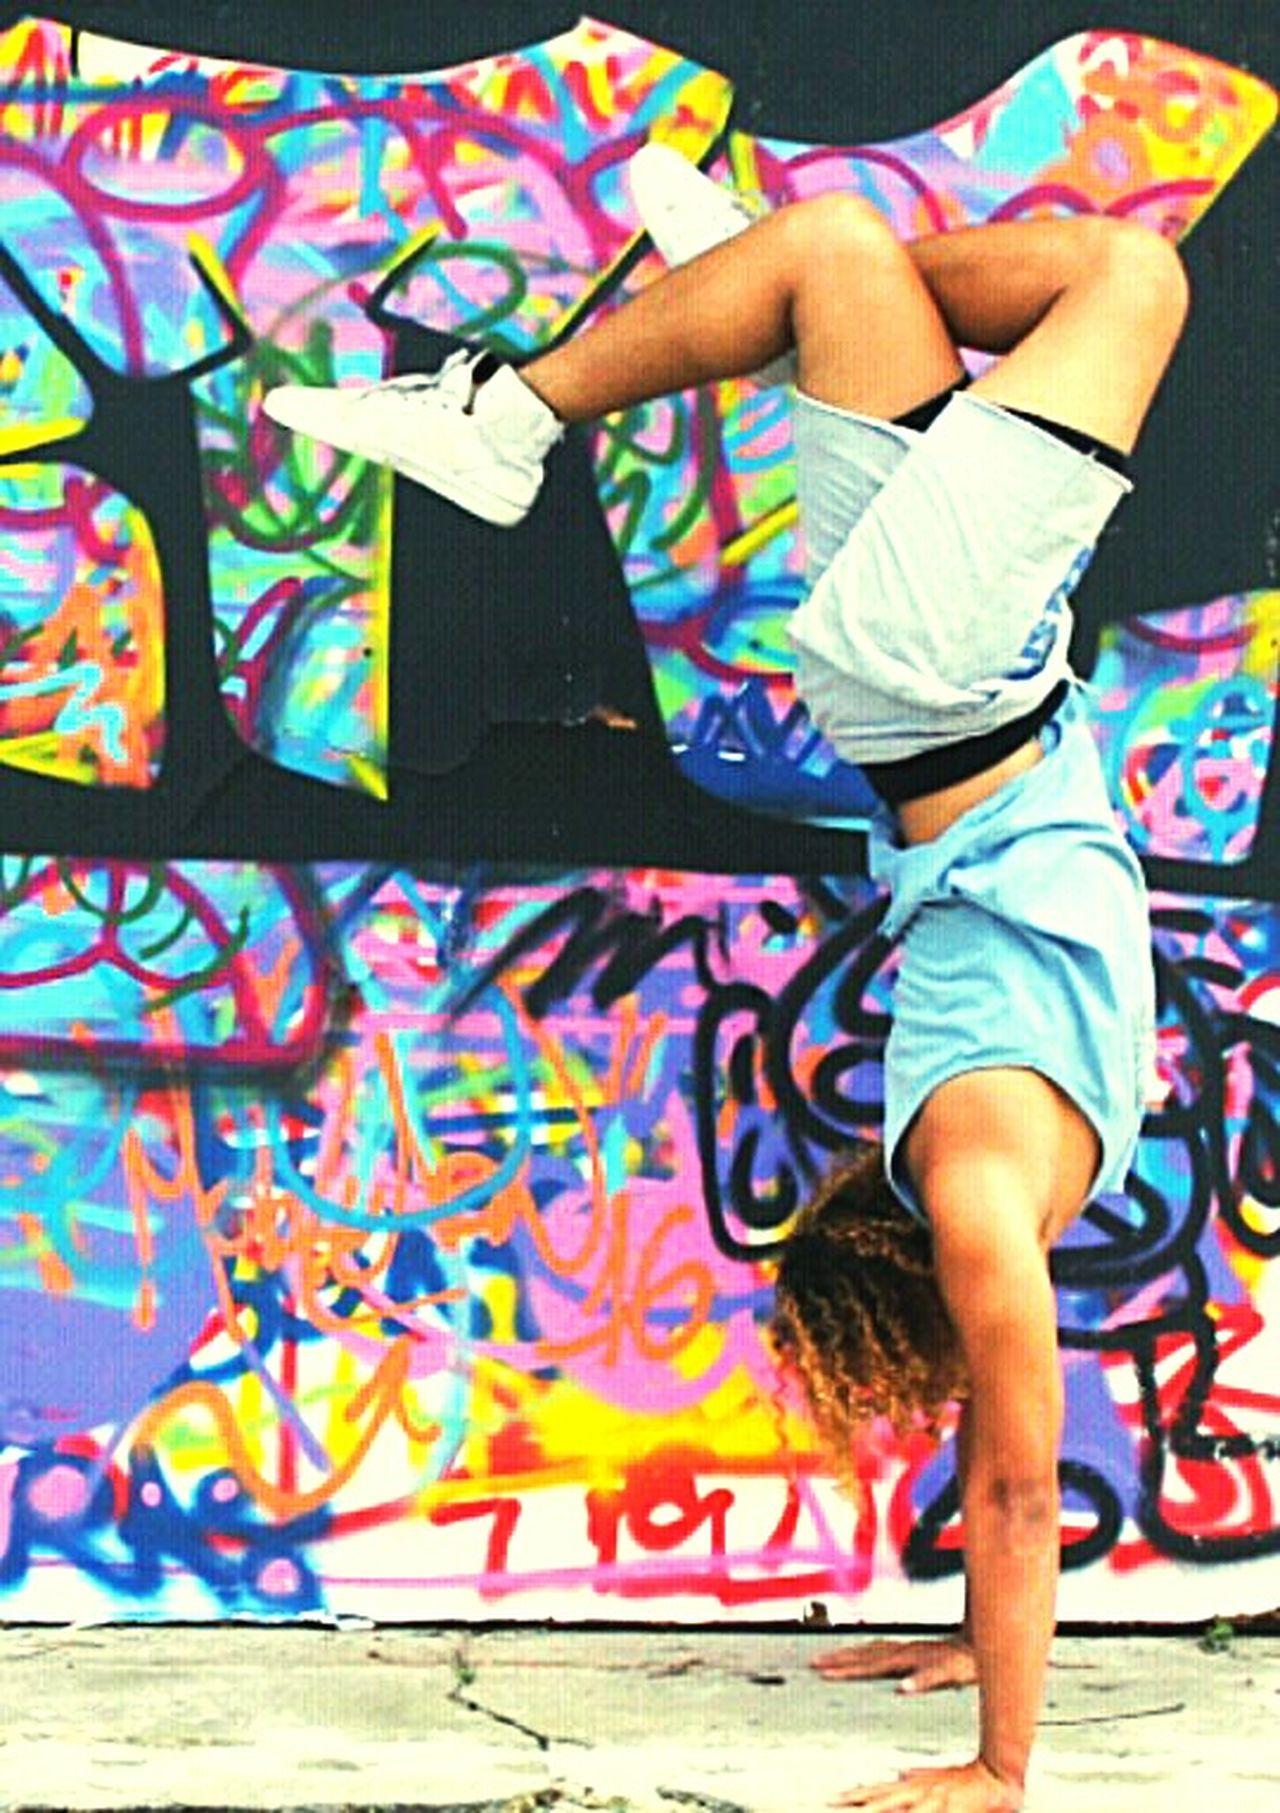 Graffiti Outdoors City Close-up Spray Paint Day First Eyeem Photo